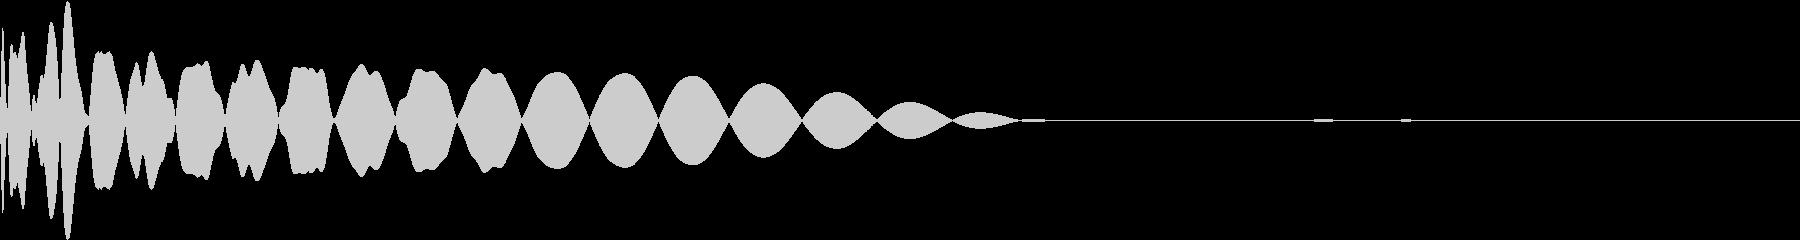 DTM Kick 35 オリジナル音源の未再生の波形